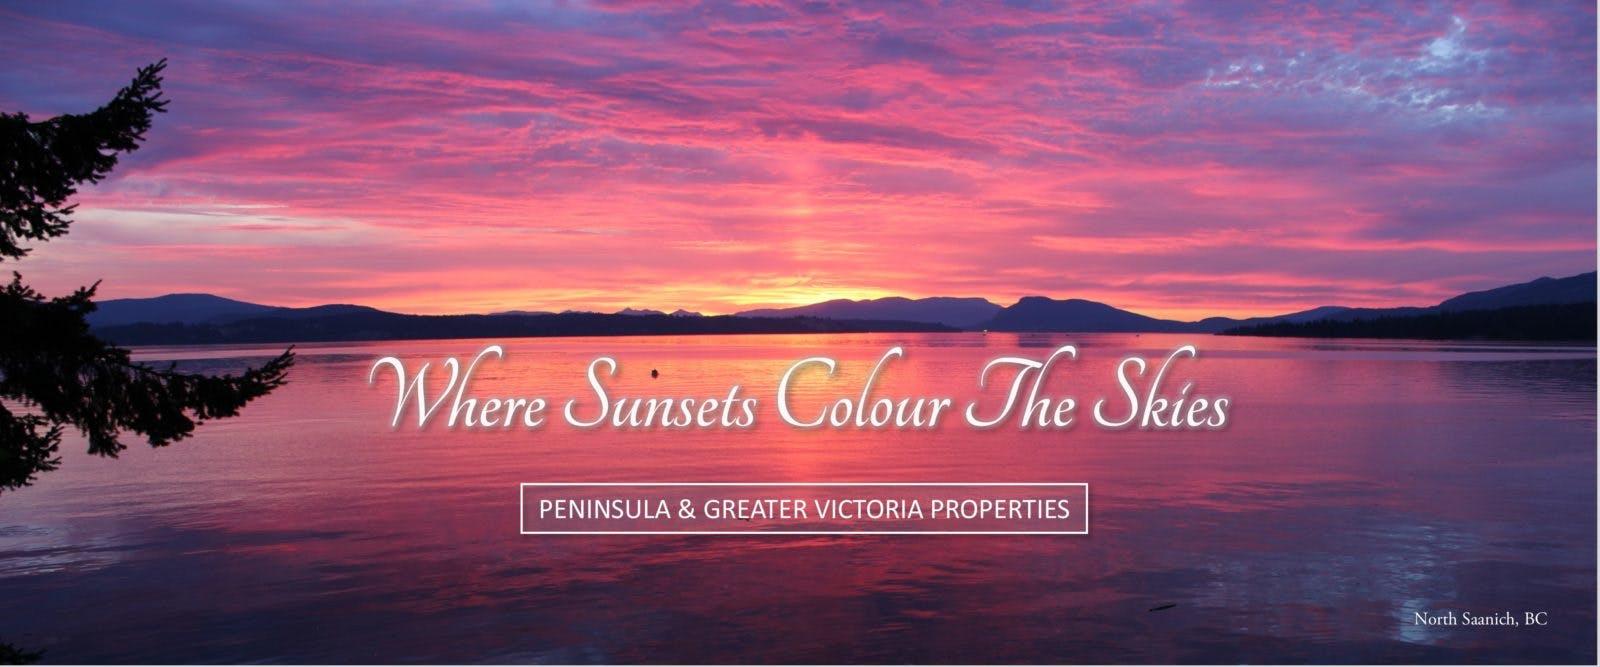 Pacifica Real Estate Inc. – North saanich BC